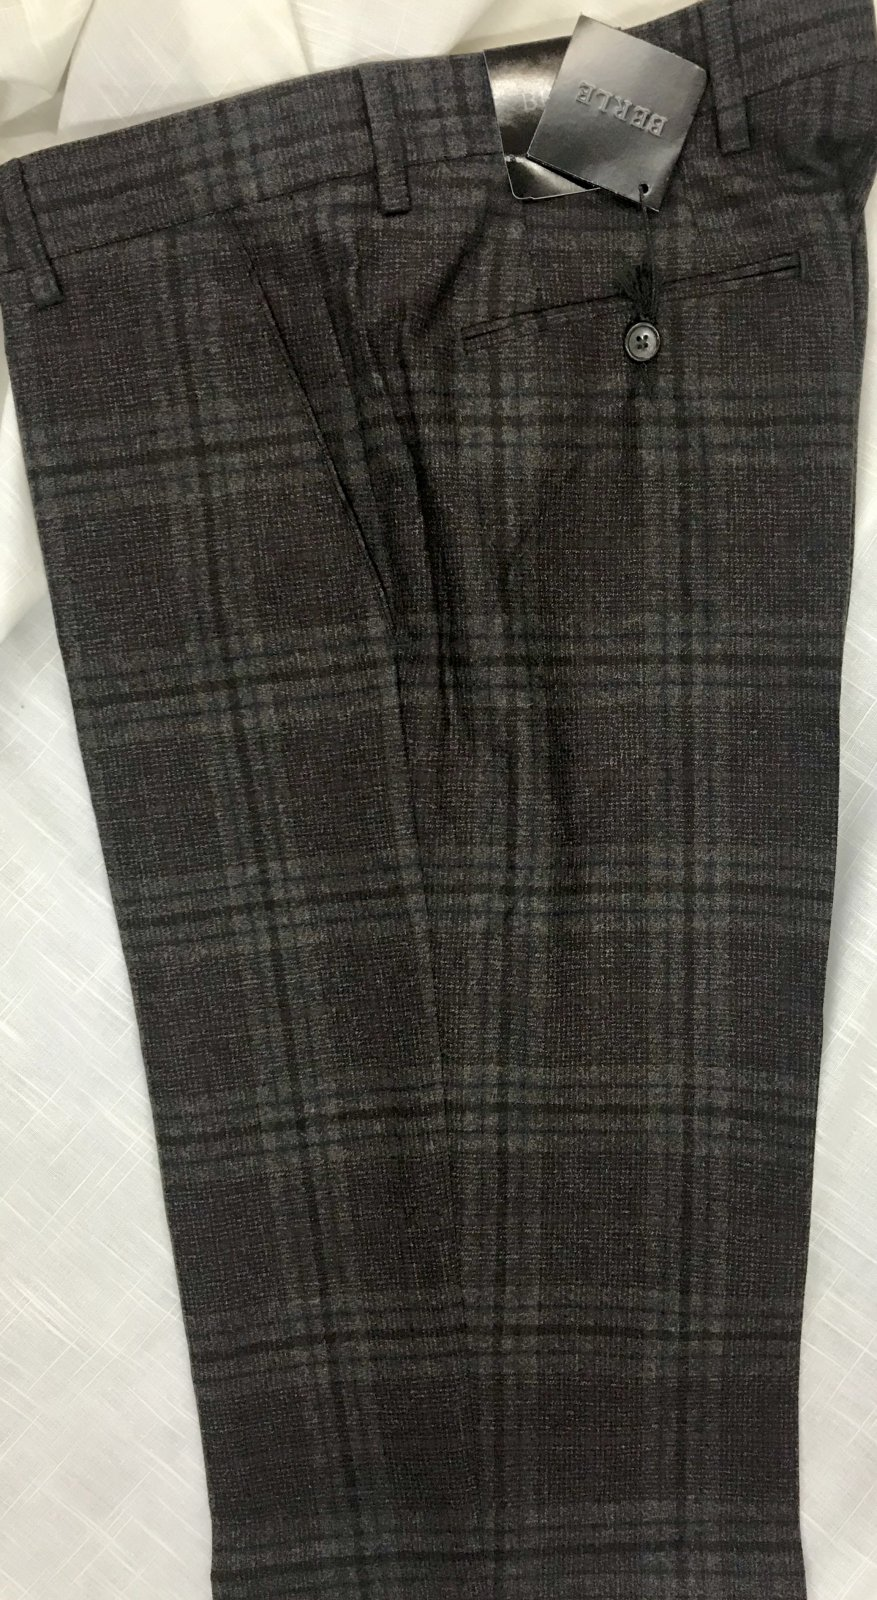 Berle Flannel Pant 8803-69